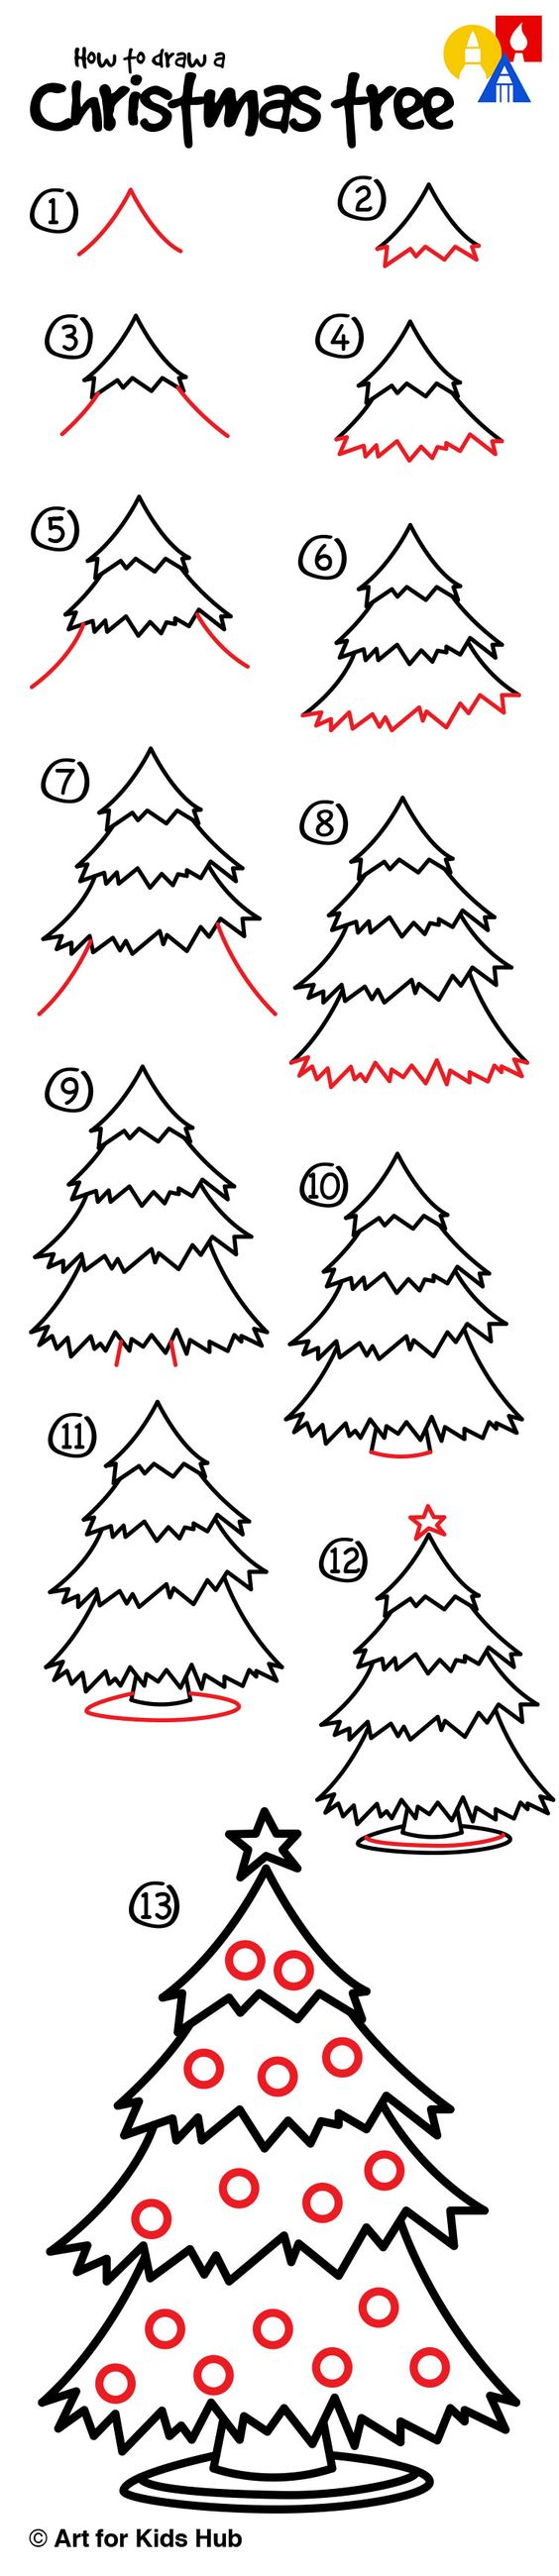 How To Draw A Christmas Tree Art For Kids Hub Art For Kids Hub Christmas Tree Art Christmas Drawing